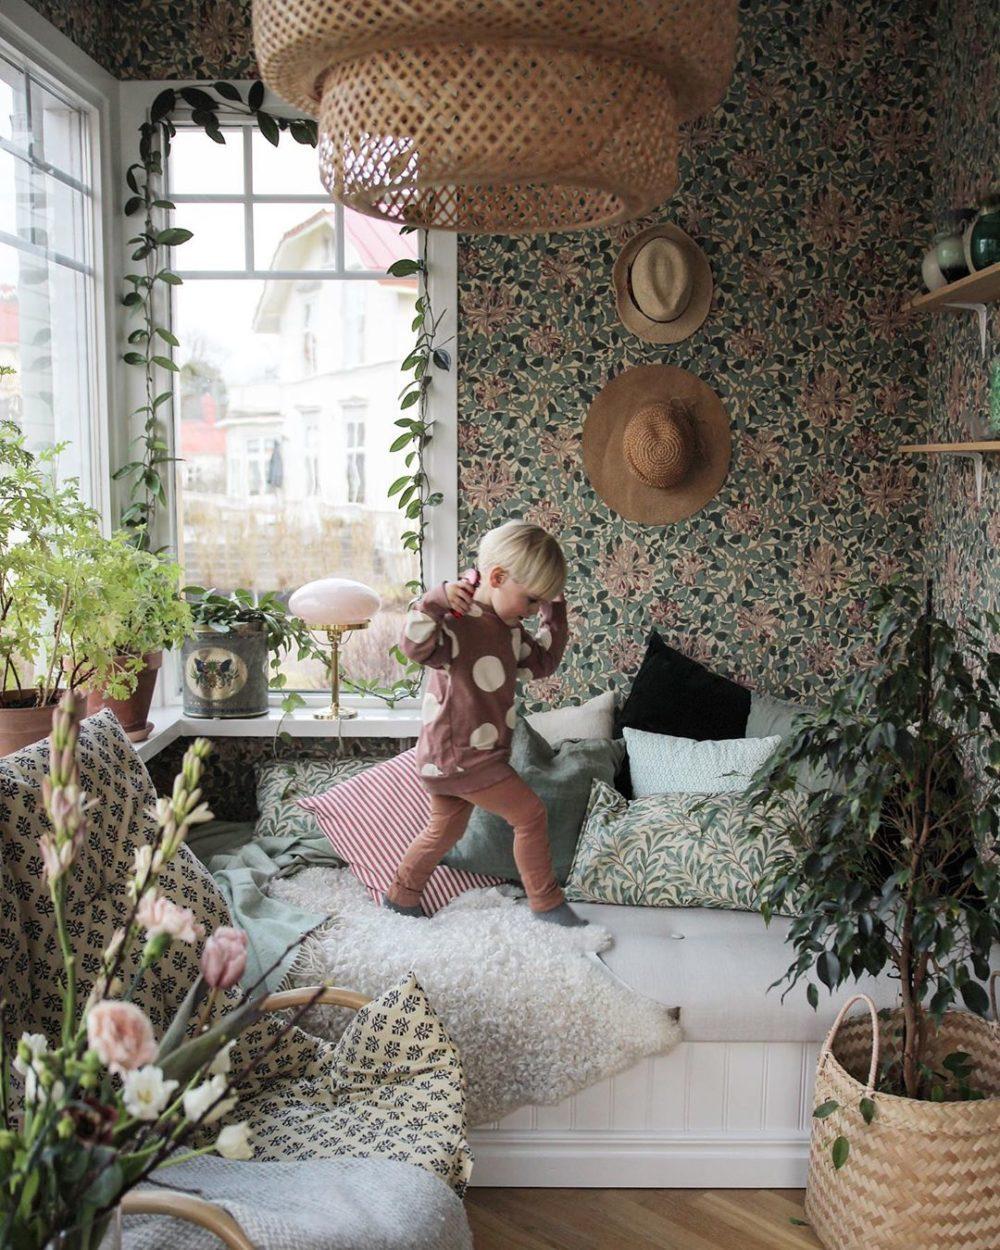 http://lovelylife.se/wp-content/uploads/hemmahosaugust_lovelylife_lindaochlouise